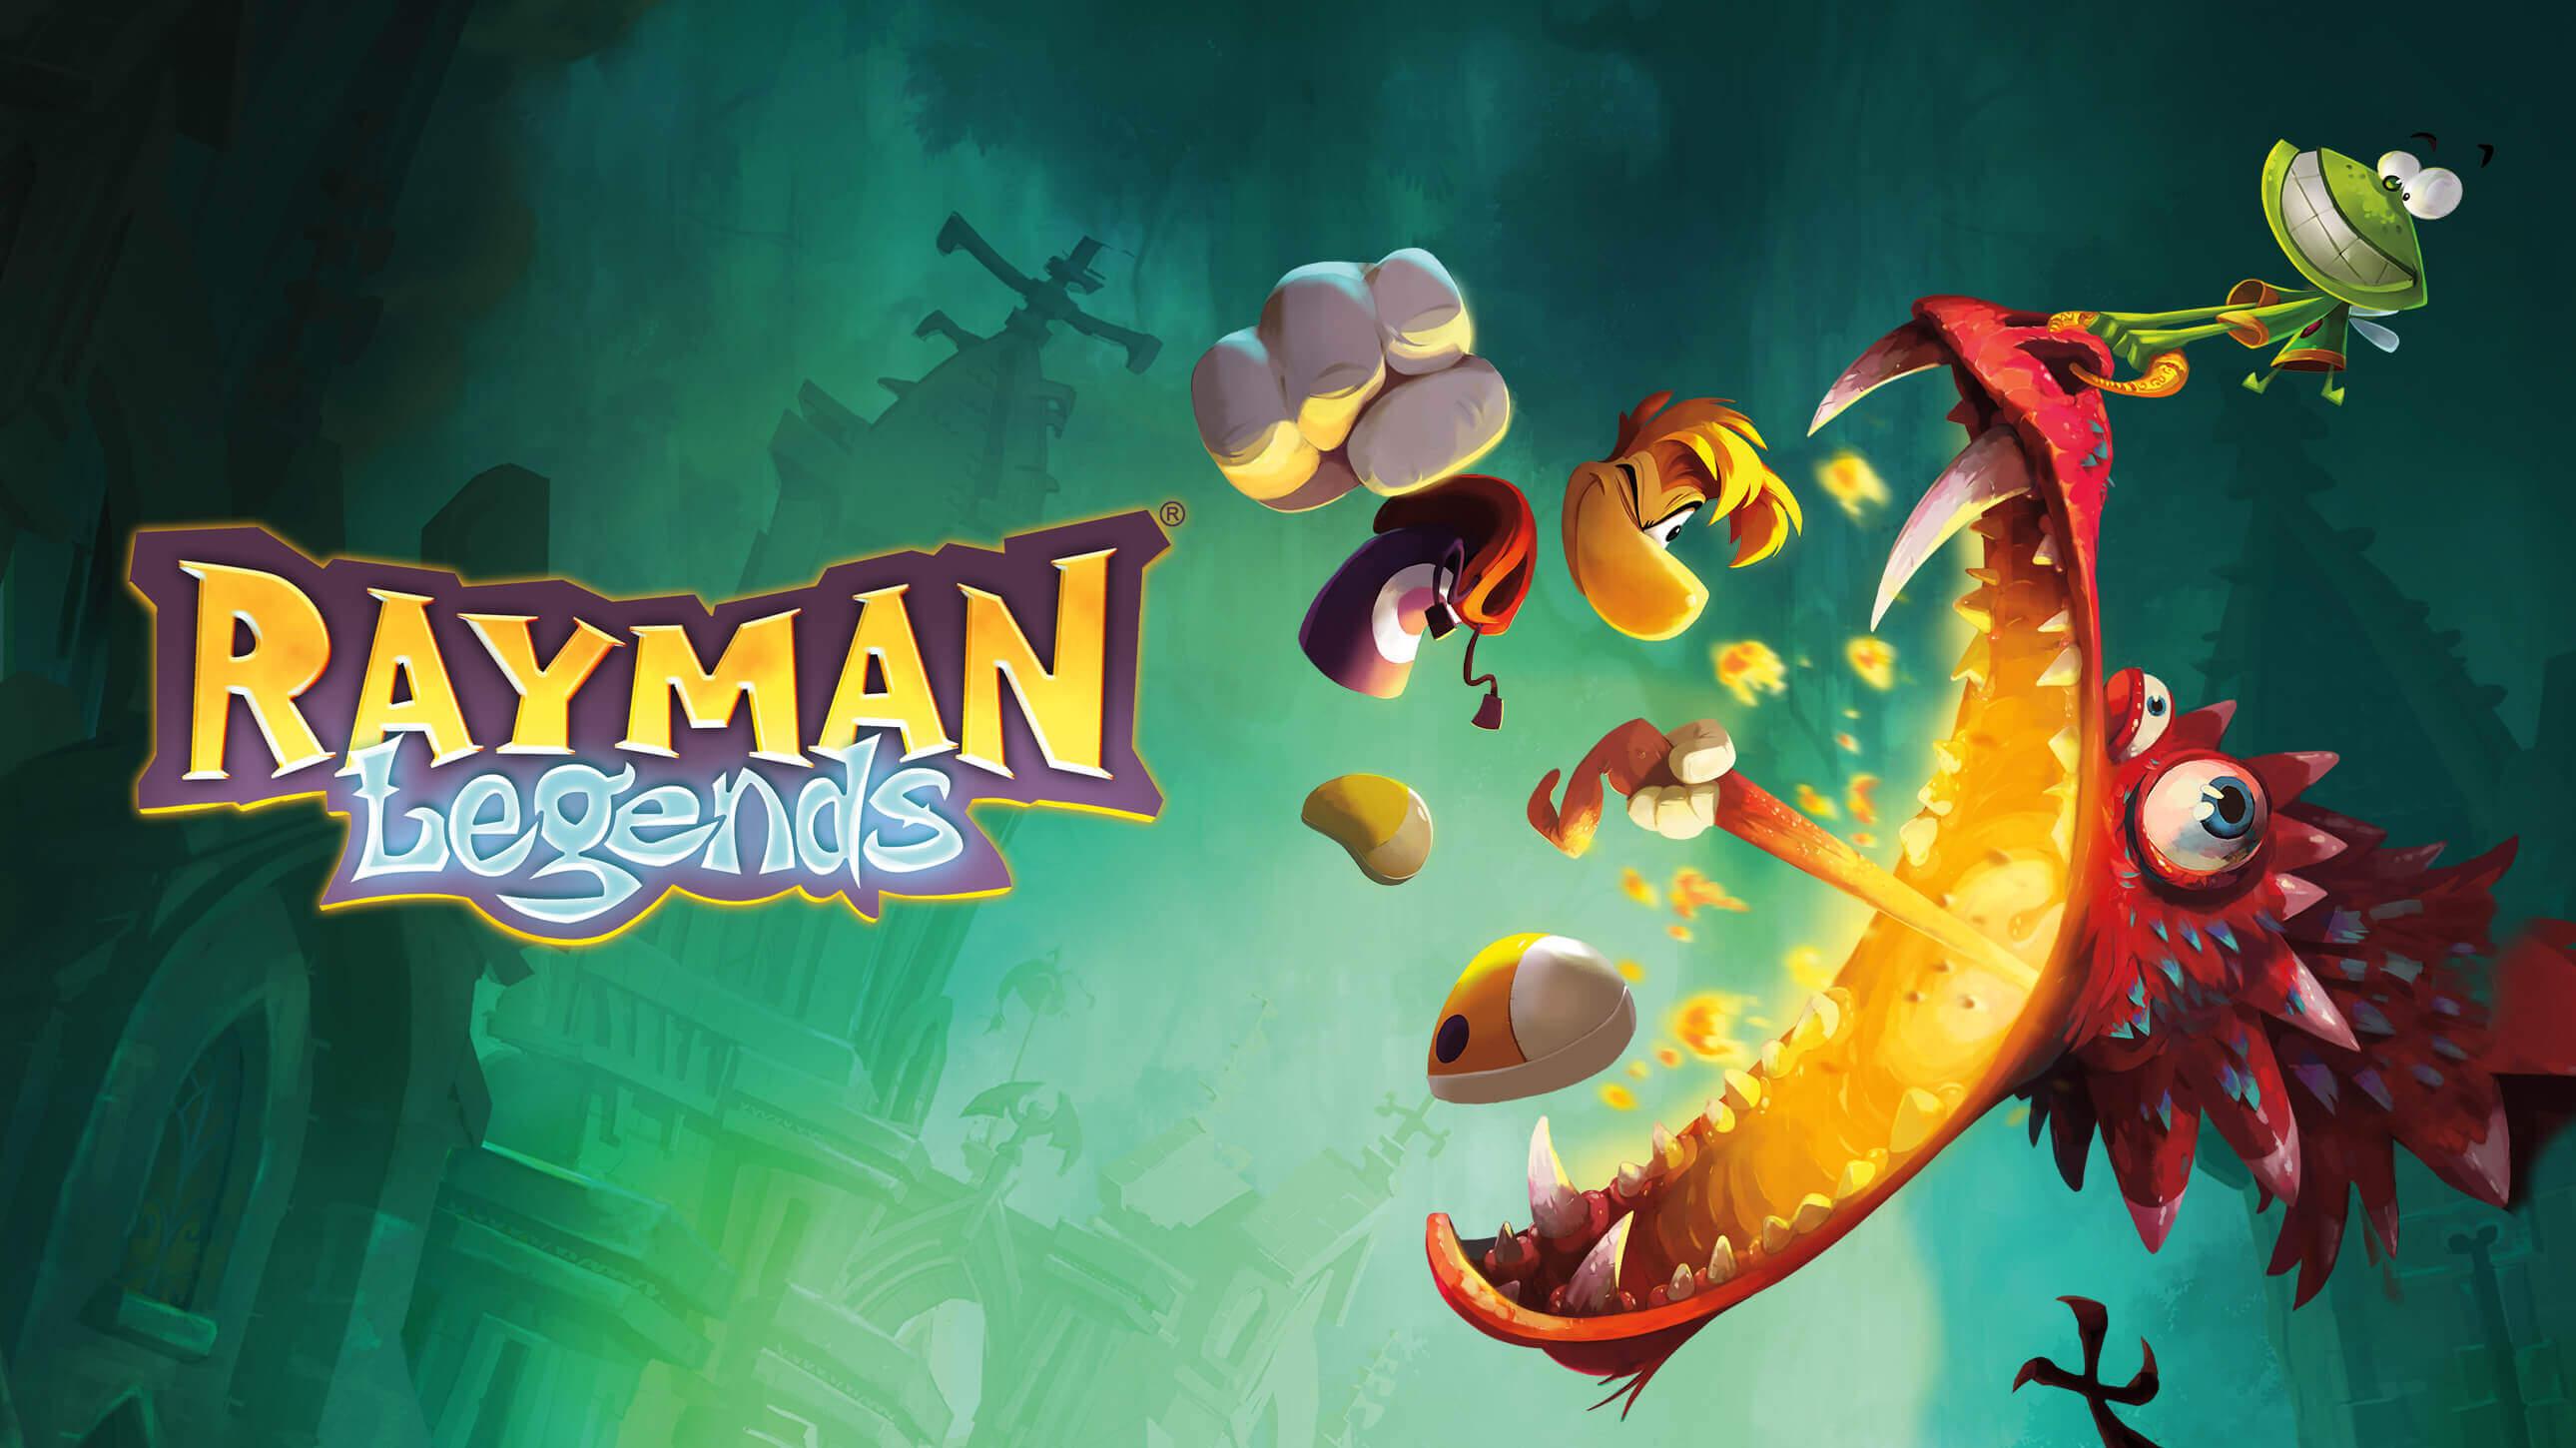 Rayman Legends do pobrania za darmo ze sklepu Epic Games Store